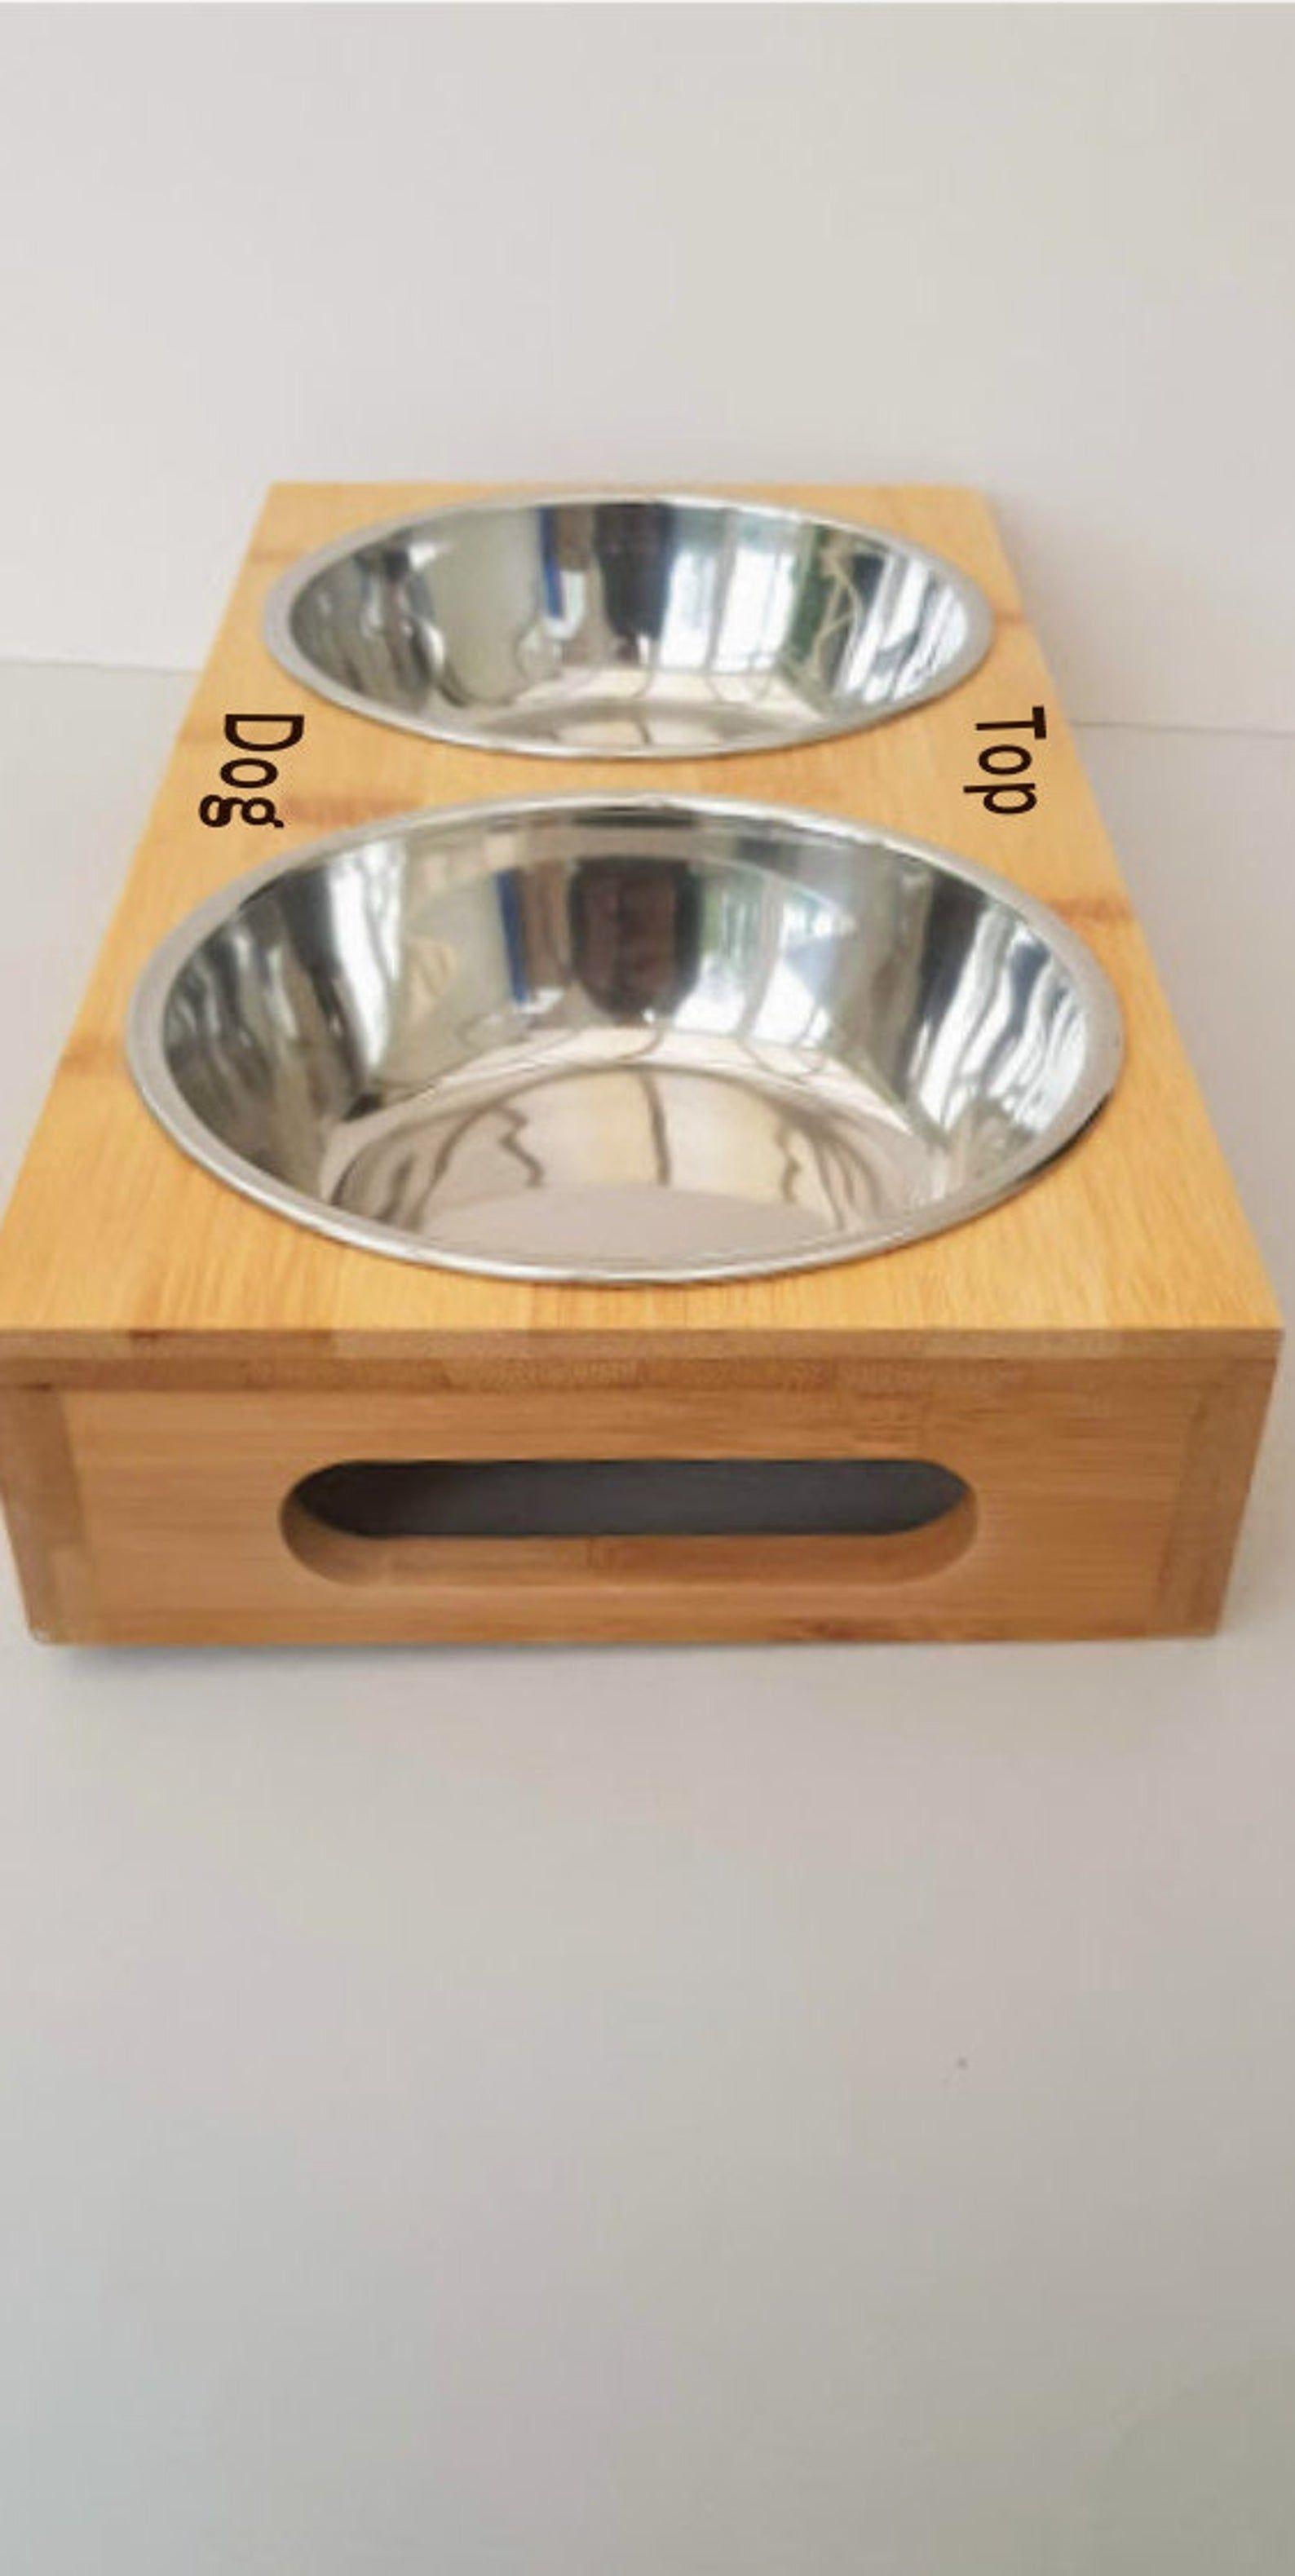 Personalised Dog Bowl And Holder Double Dog Bowls Pet Feeding Bowl Cat Feeding Bowl Engraved Pet Bowl Holder Personalized Dog Bowls Dog Bowls Pet Bowls